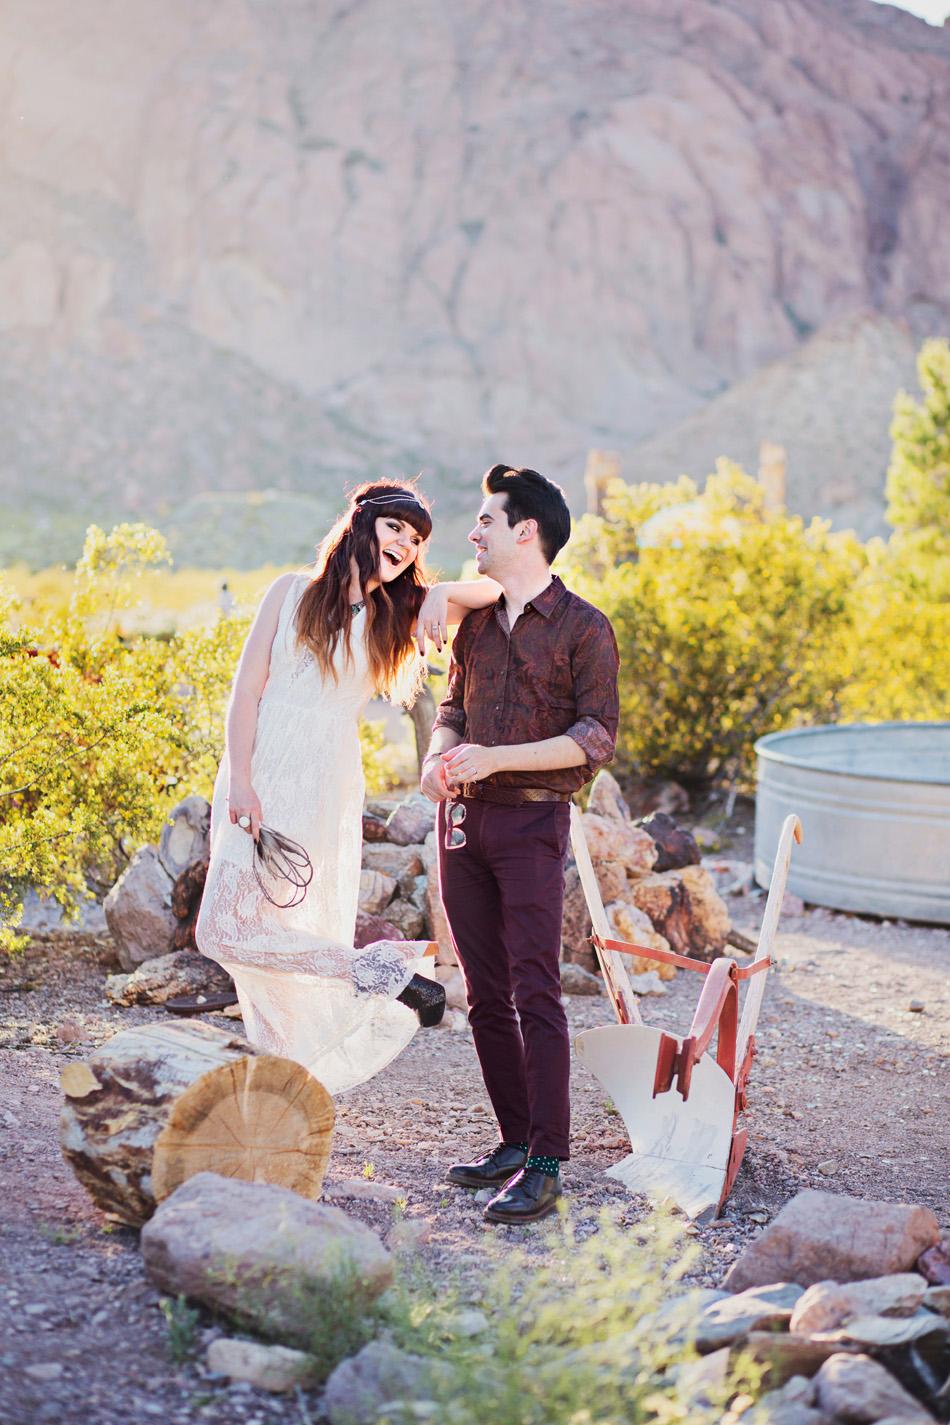 photographe-mariage-las-vegas-floriane-caux-poppylarue (32)